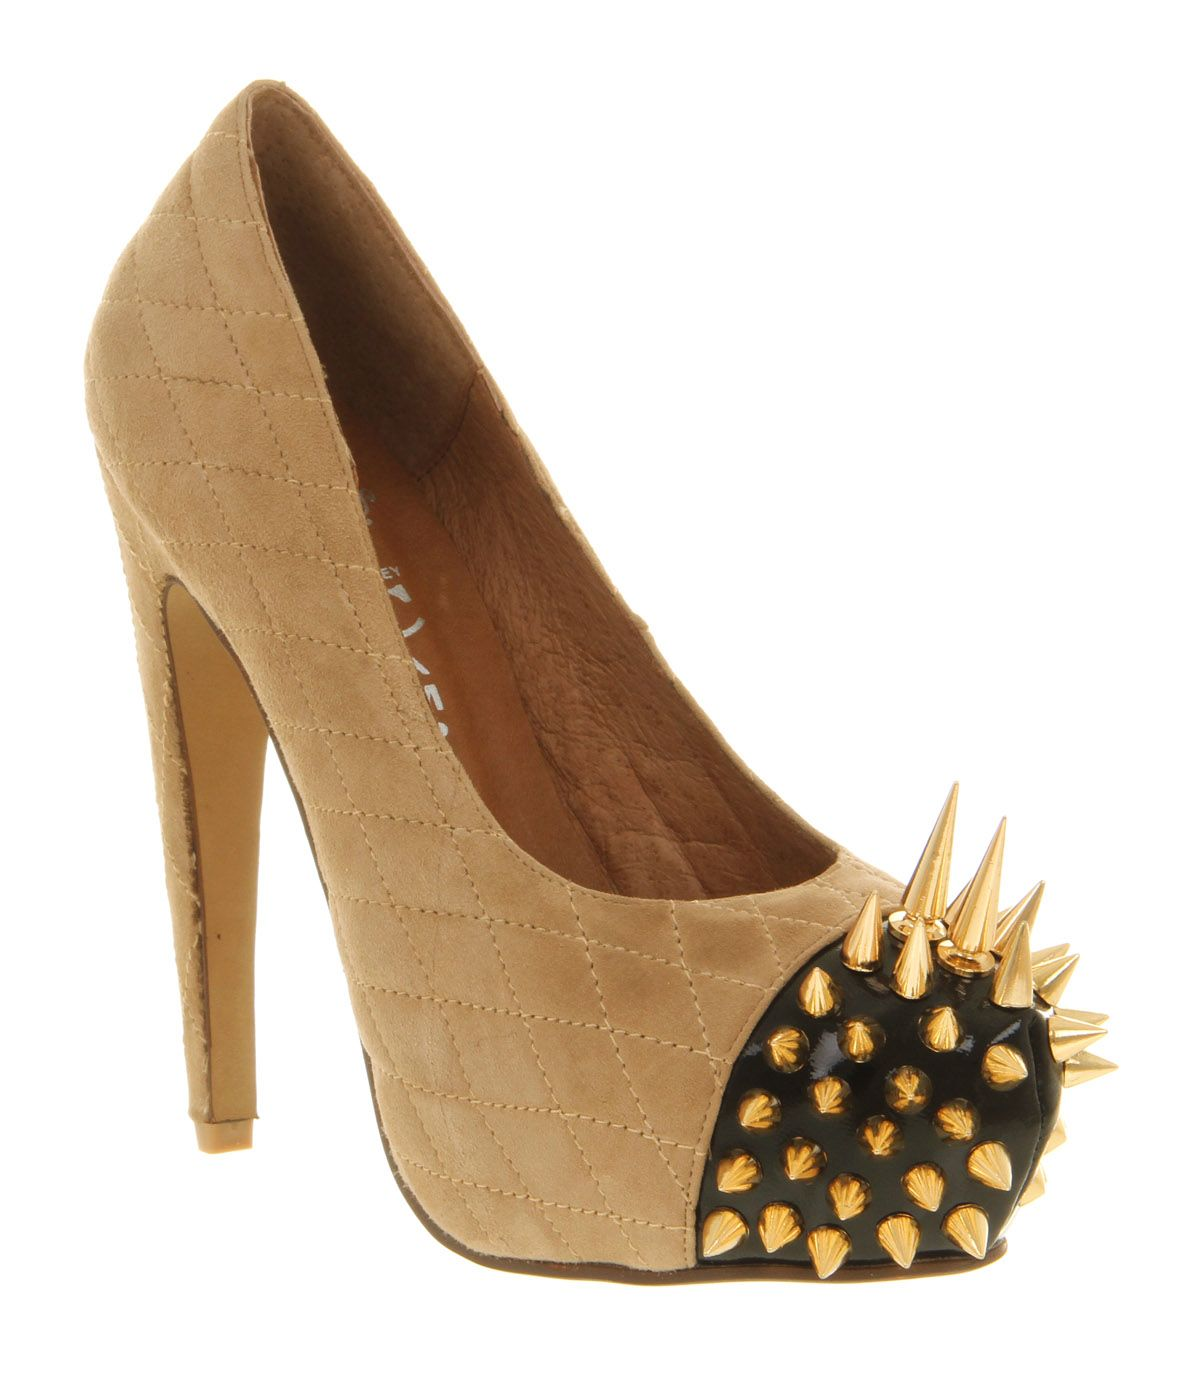 Womens Jeffrey Campbell Battle Spike High Heel NUDE SUEDE GOLD SPIKES Heels